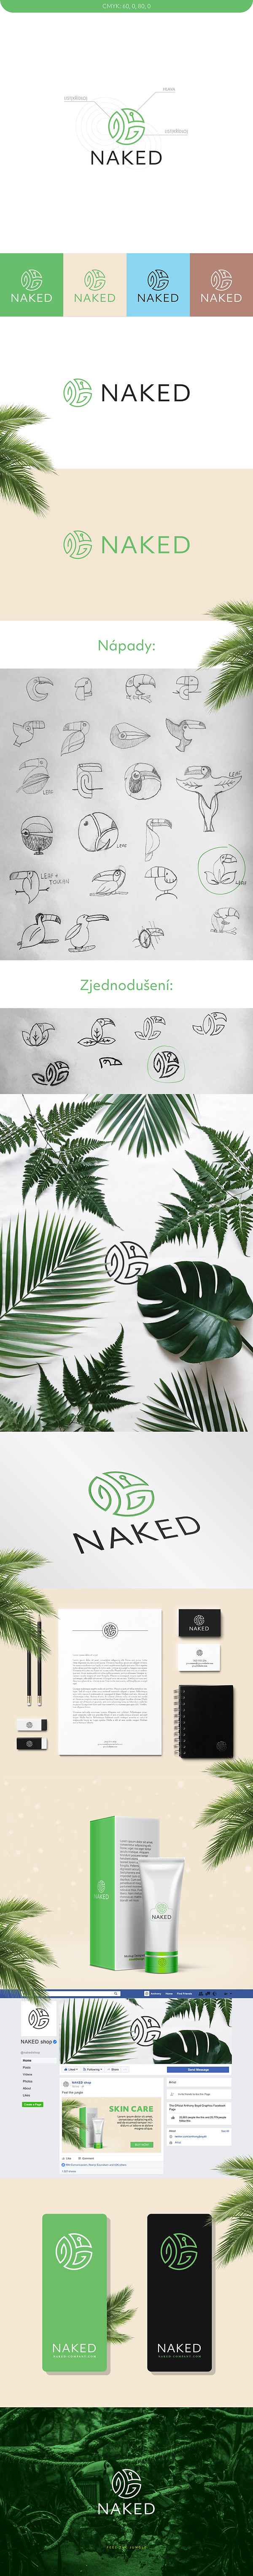 logo_na-web.jpg